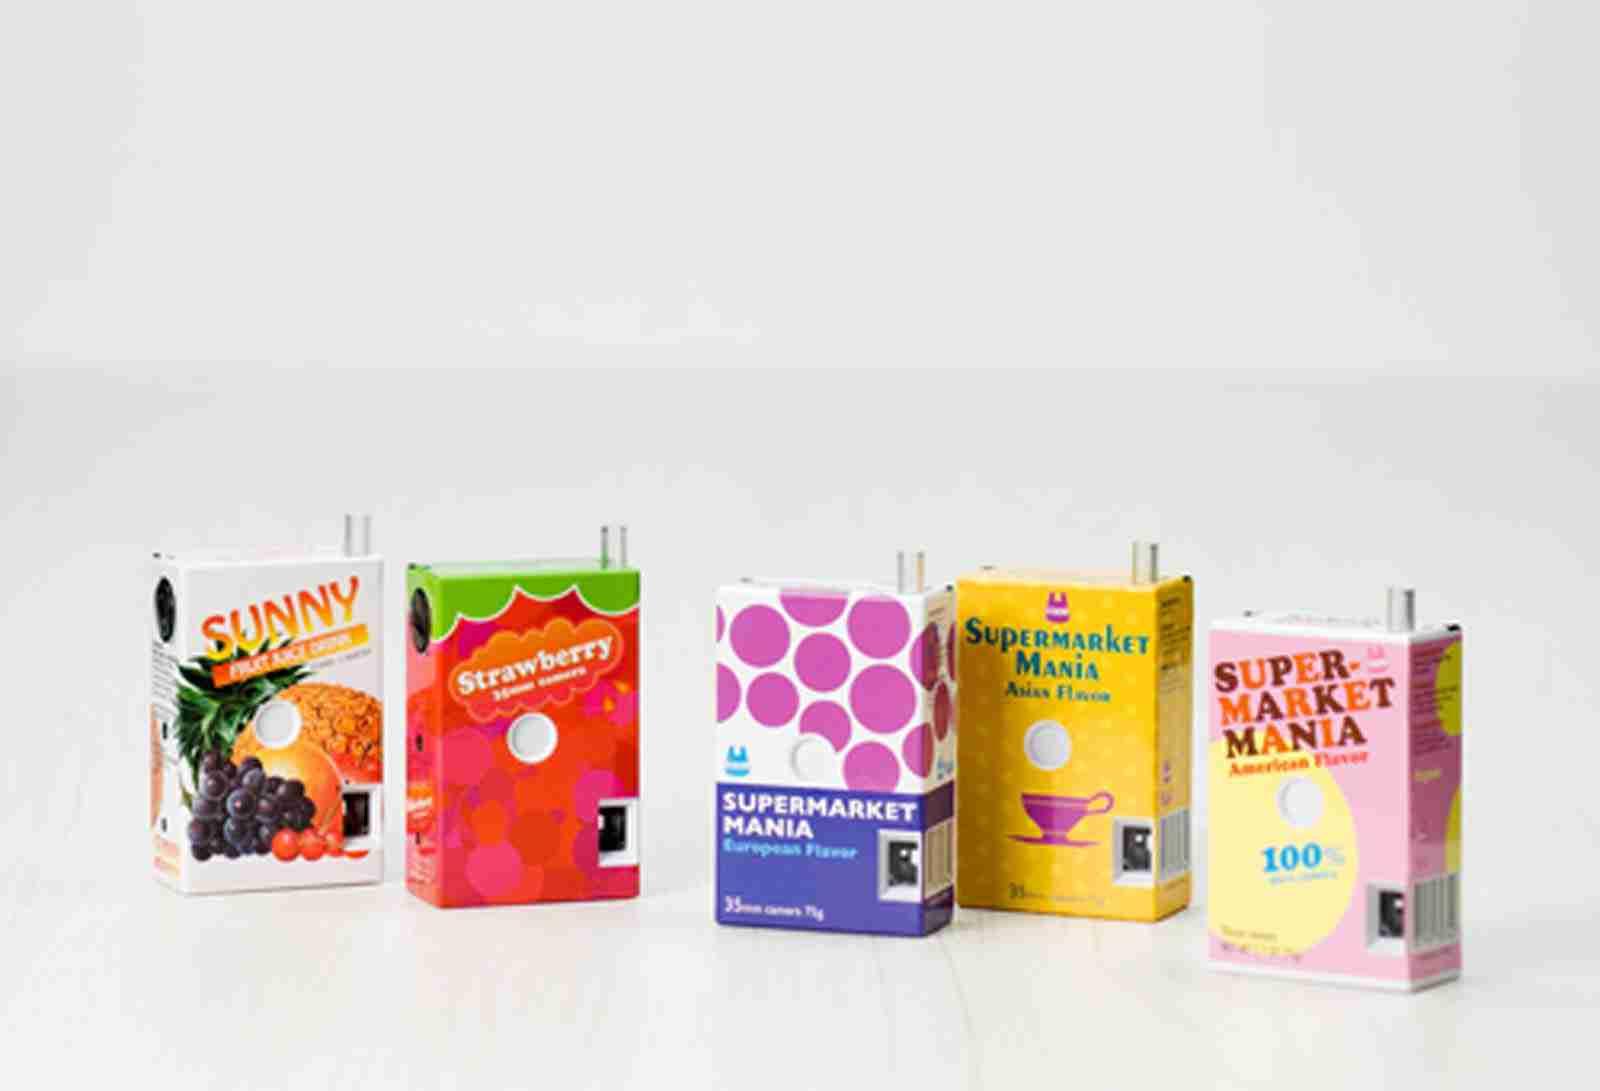 Fuuvi Juice Box 35mm Film Point-n-Click Camera - Apple